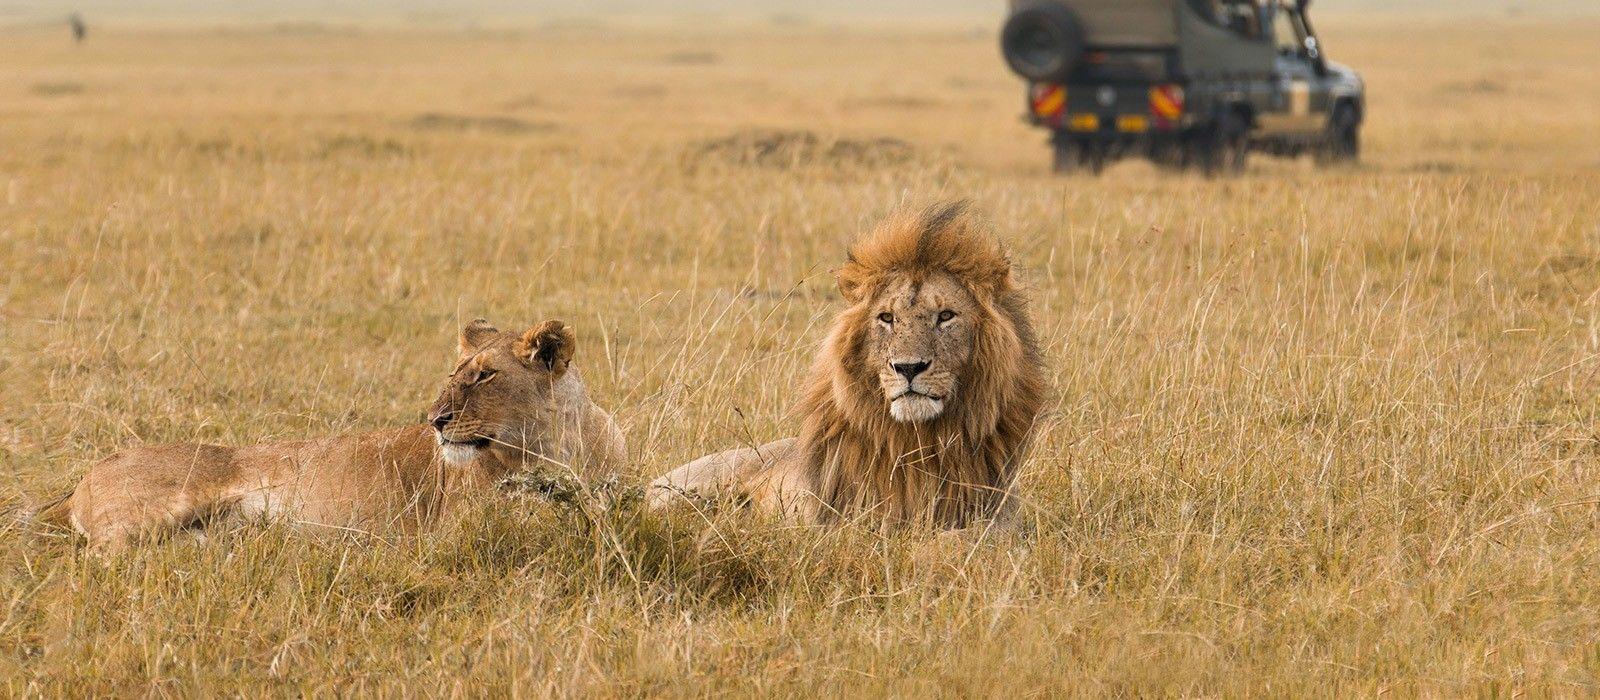 Kenia – Safari und Baden: Masai Mara & Traumstrände Urlaub 2